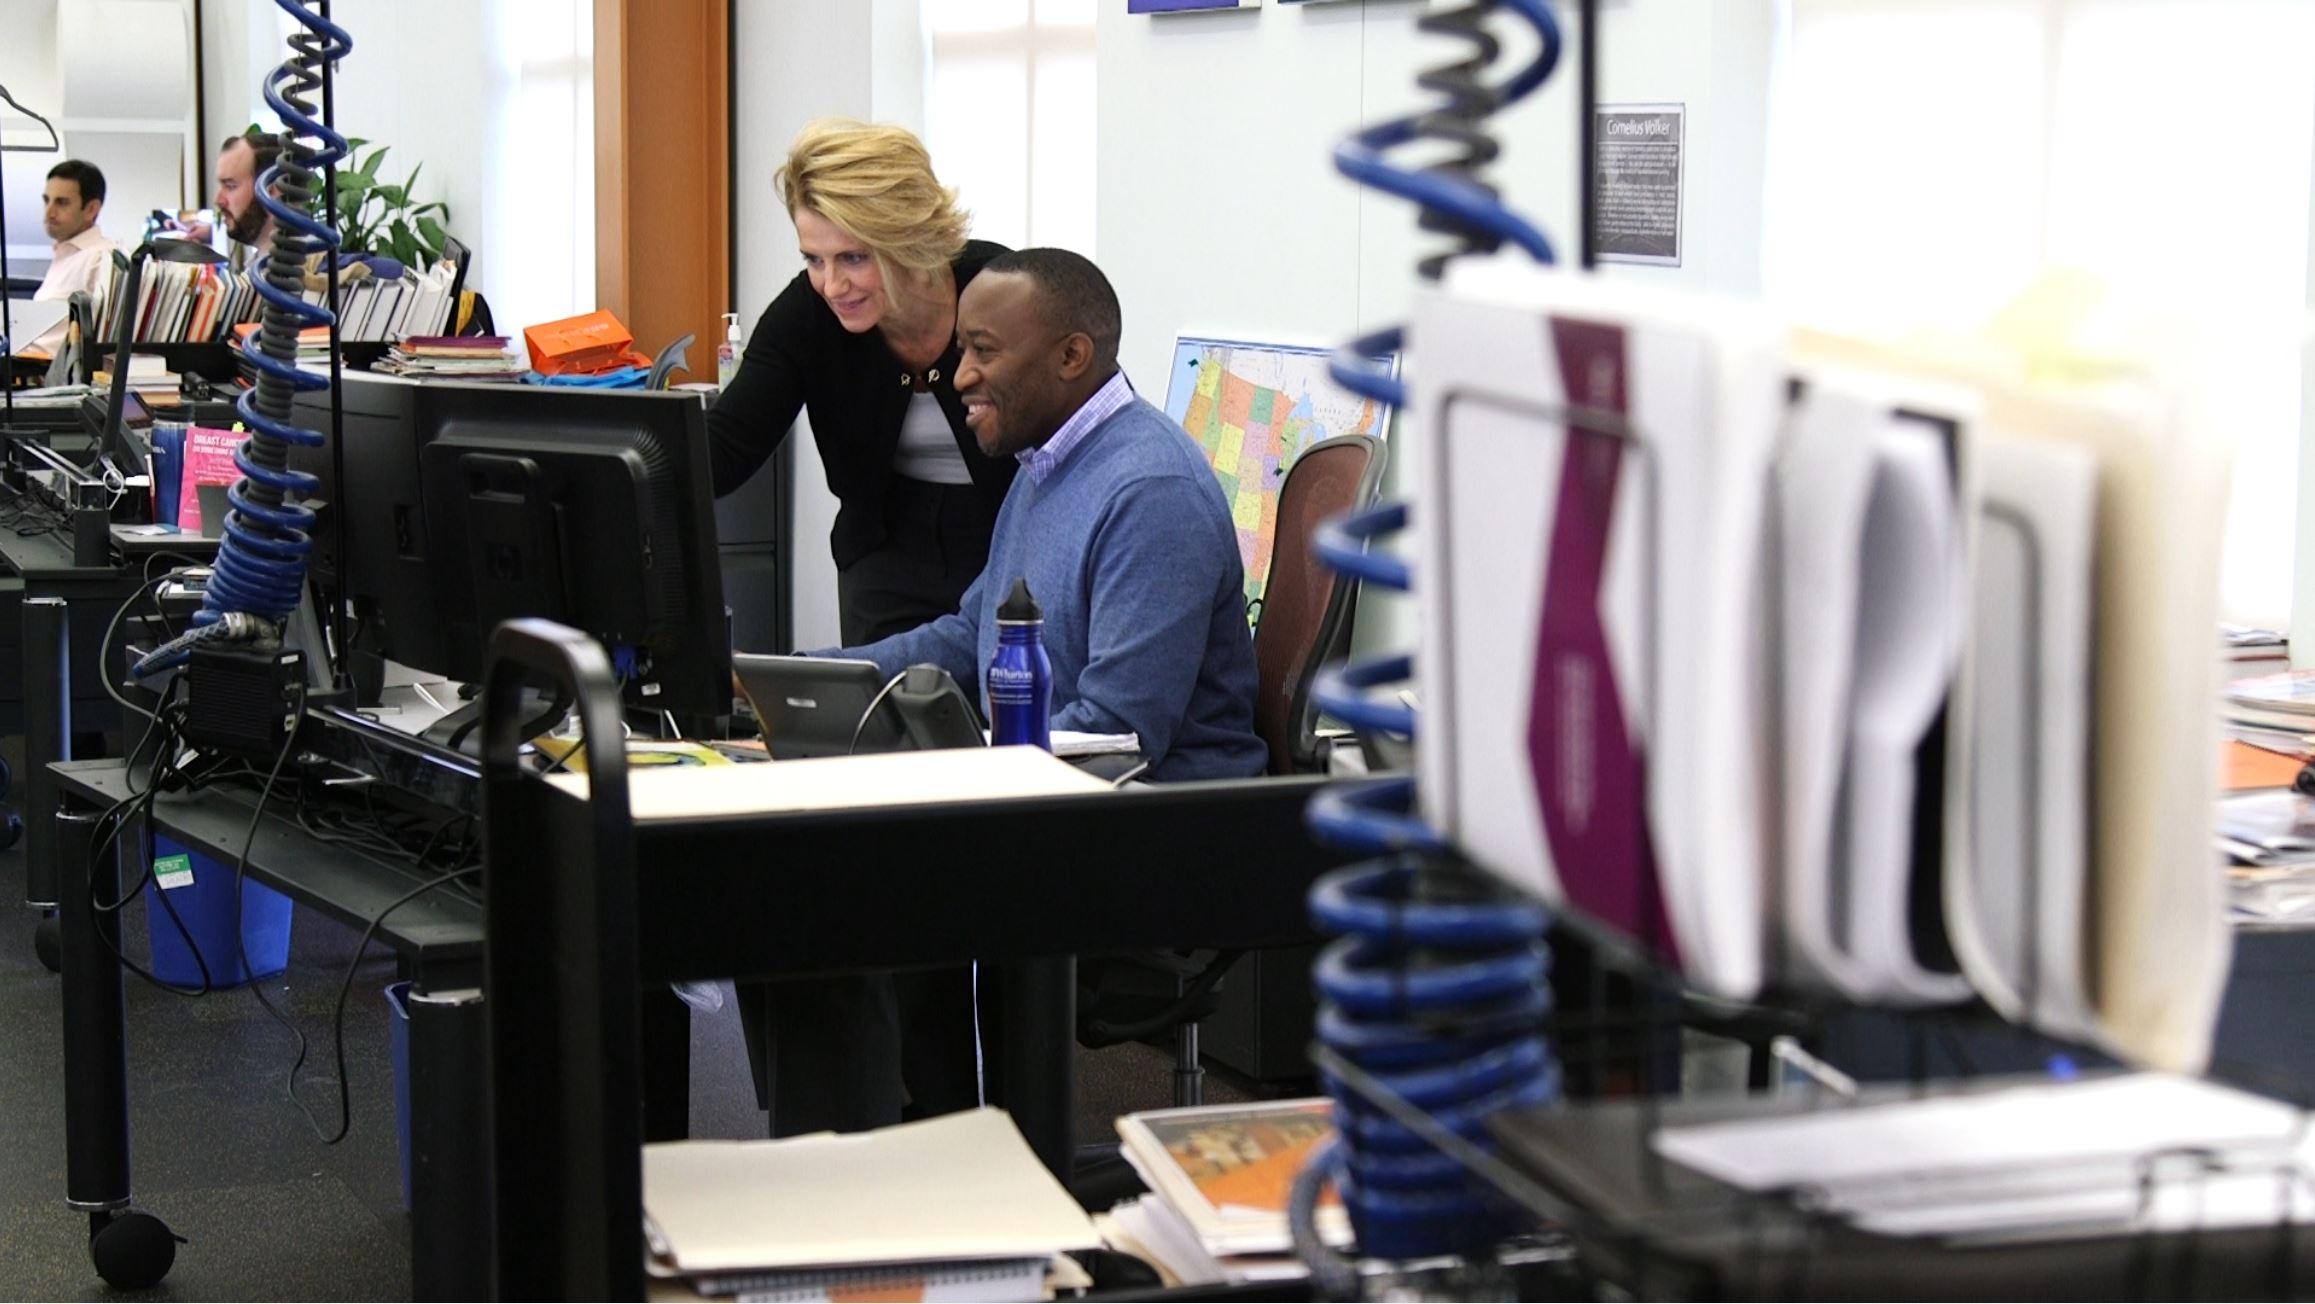 SEI Employees Working